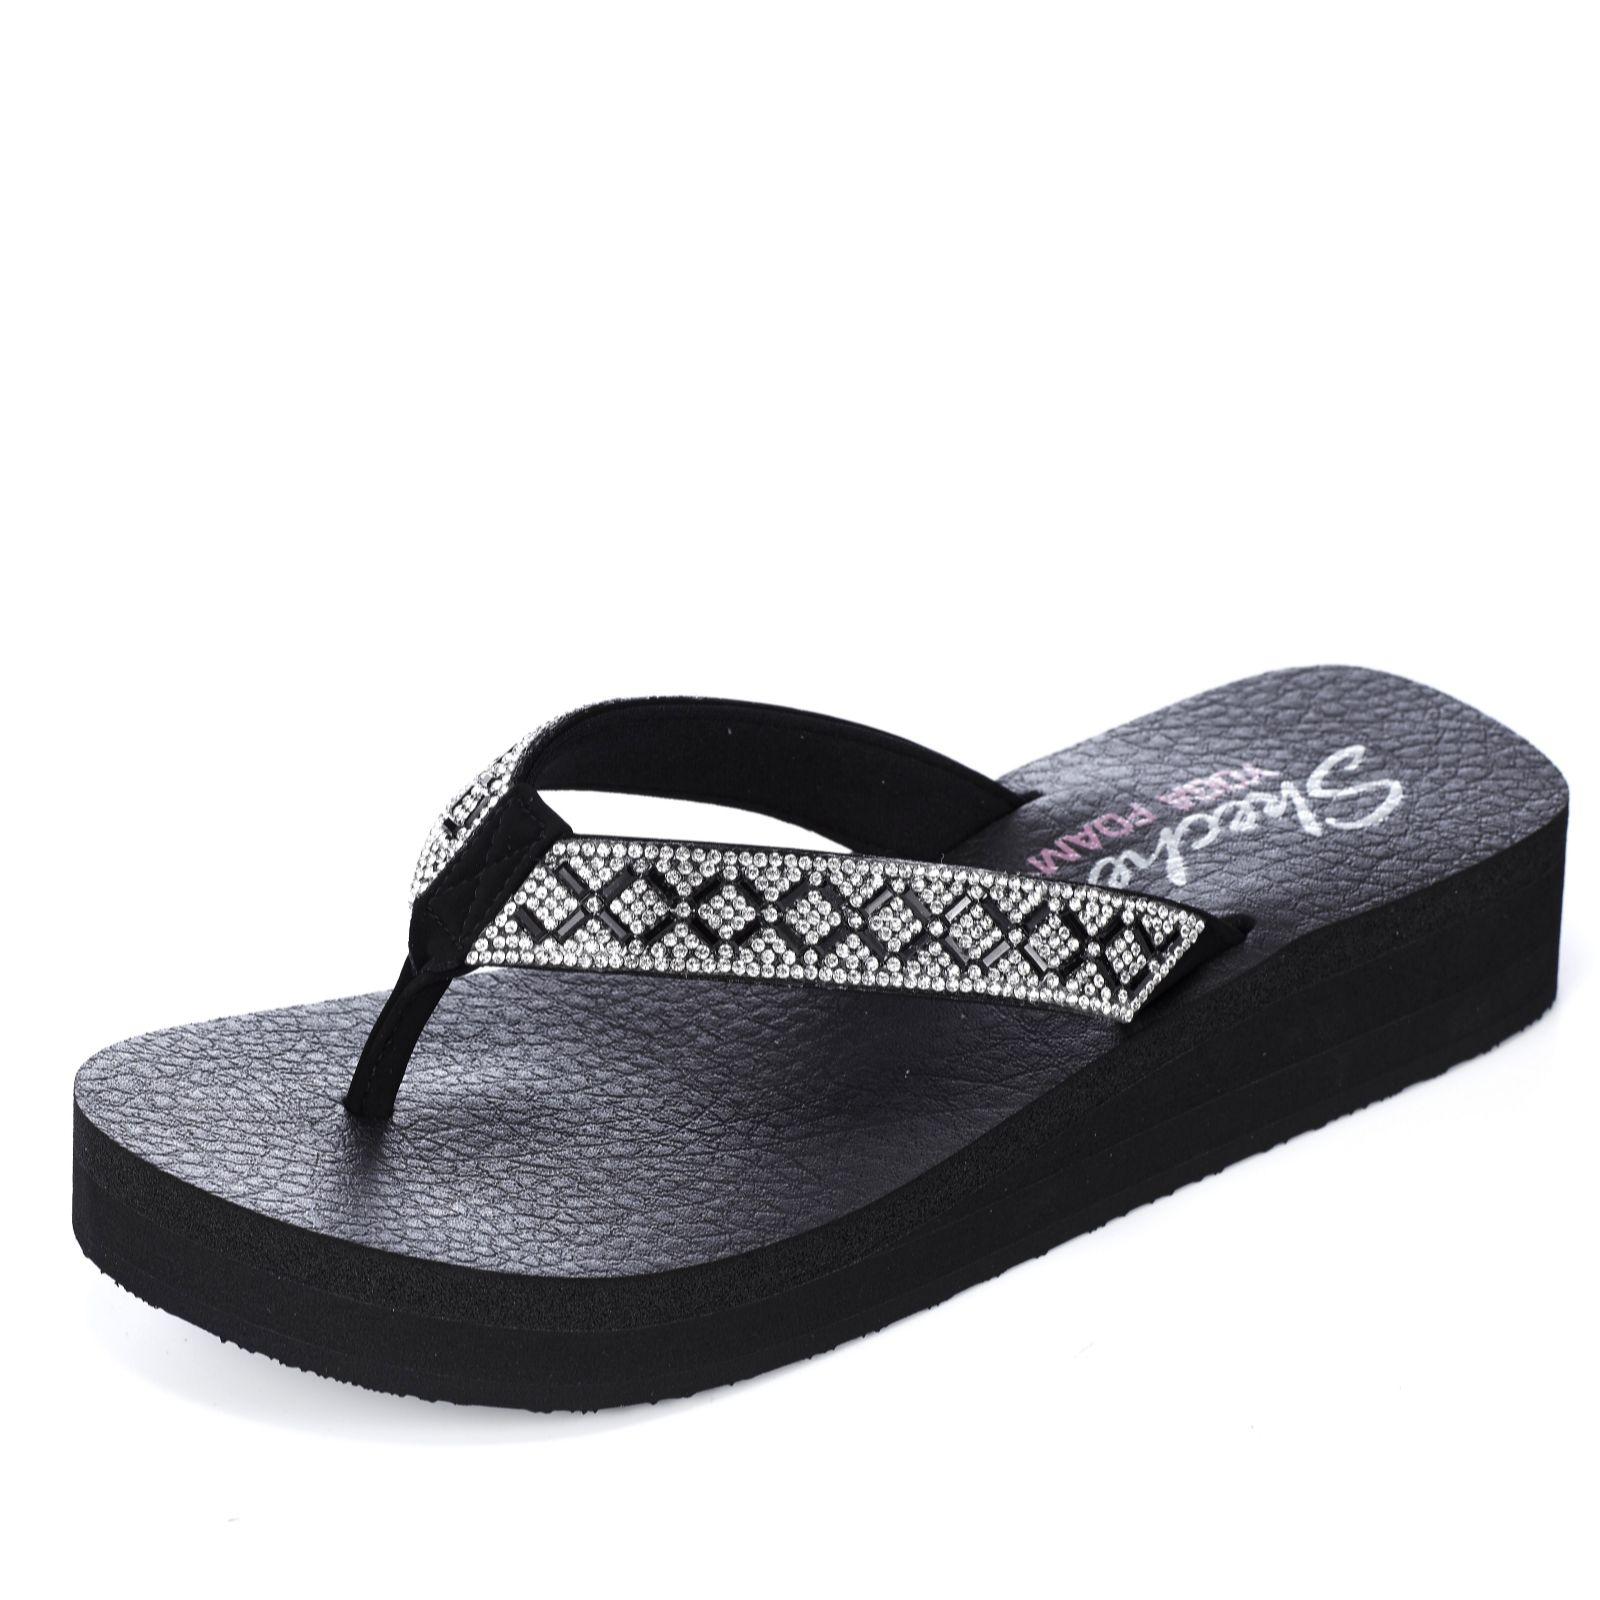 skechers yoga mat sandals. skechers vinyasa criss cross platform flip flop with yoga foam - qvc uk mat sandals